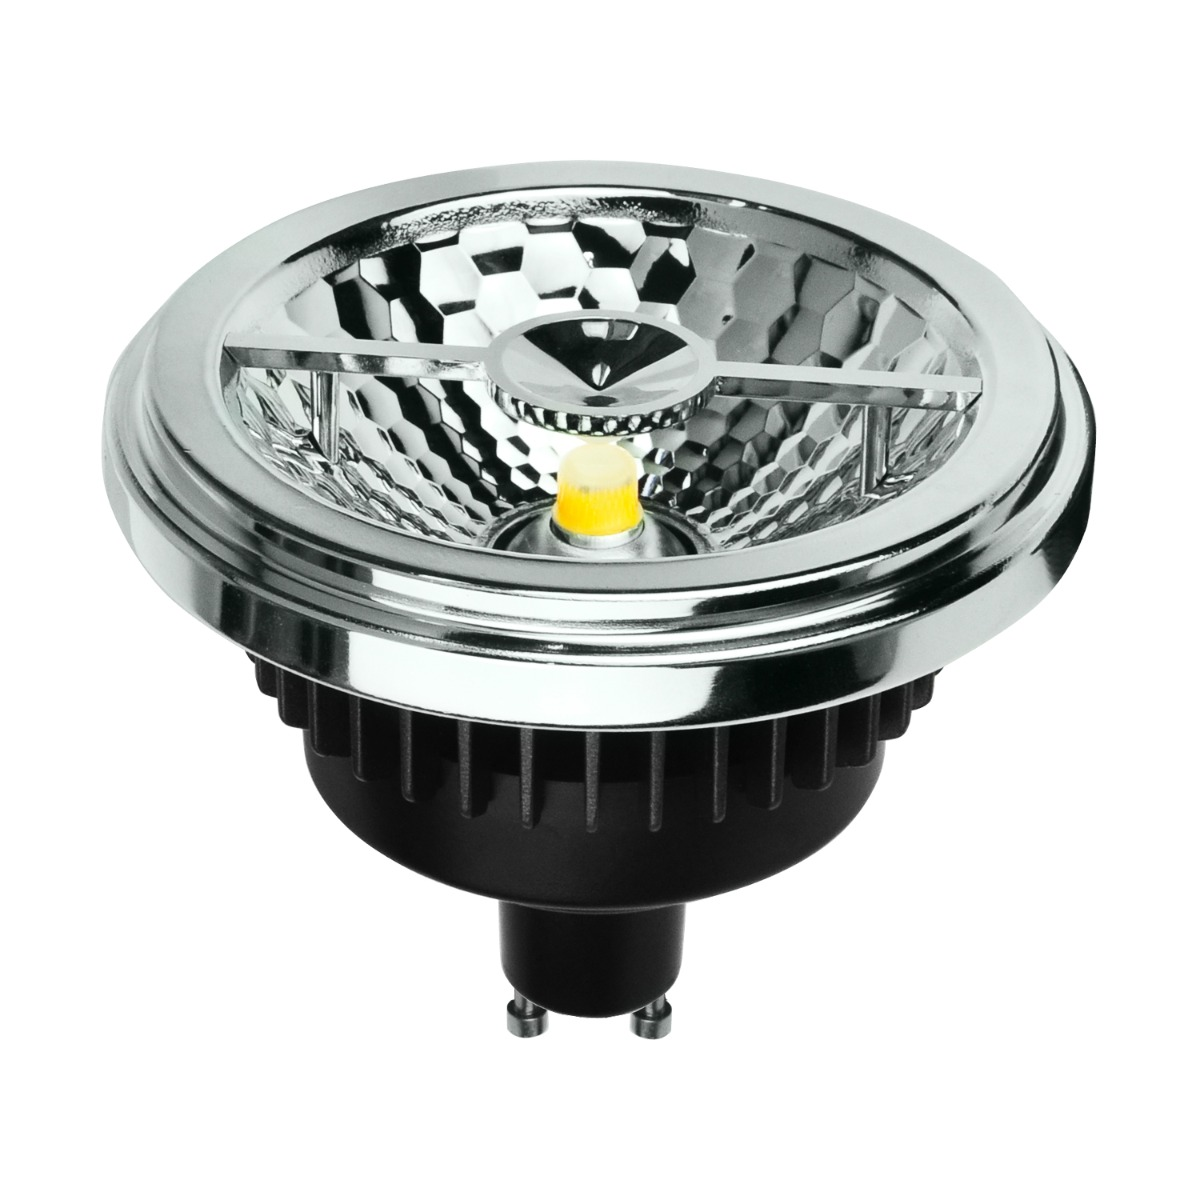 Noxion LEDspot AR111 GU10 Pro V2.0 15-75W 930 40D 800lm DIM